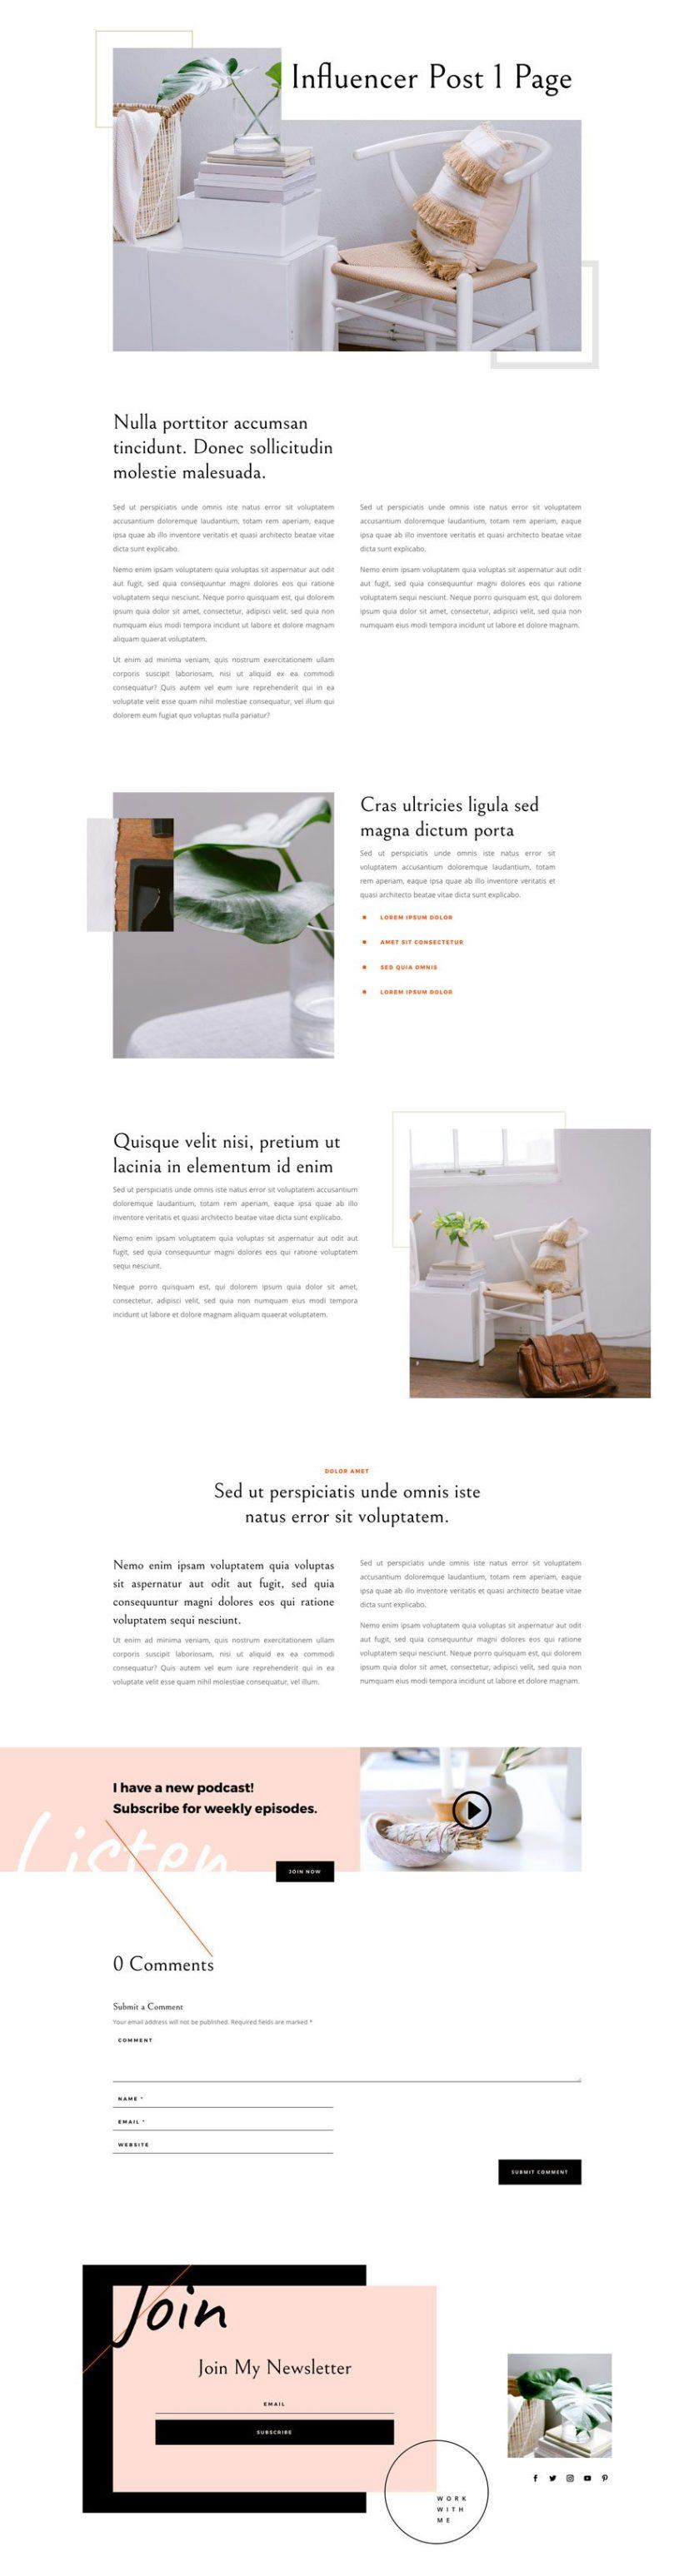 divi influencer layout pack